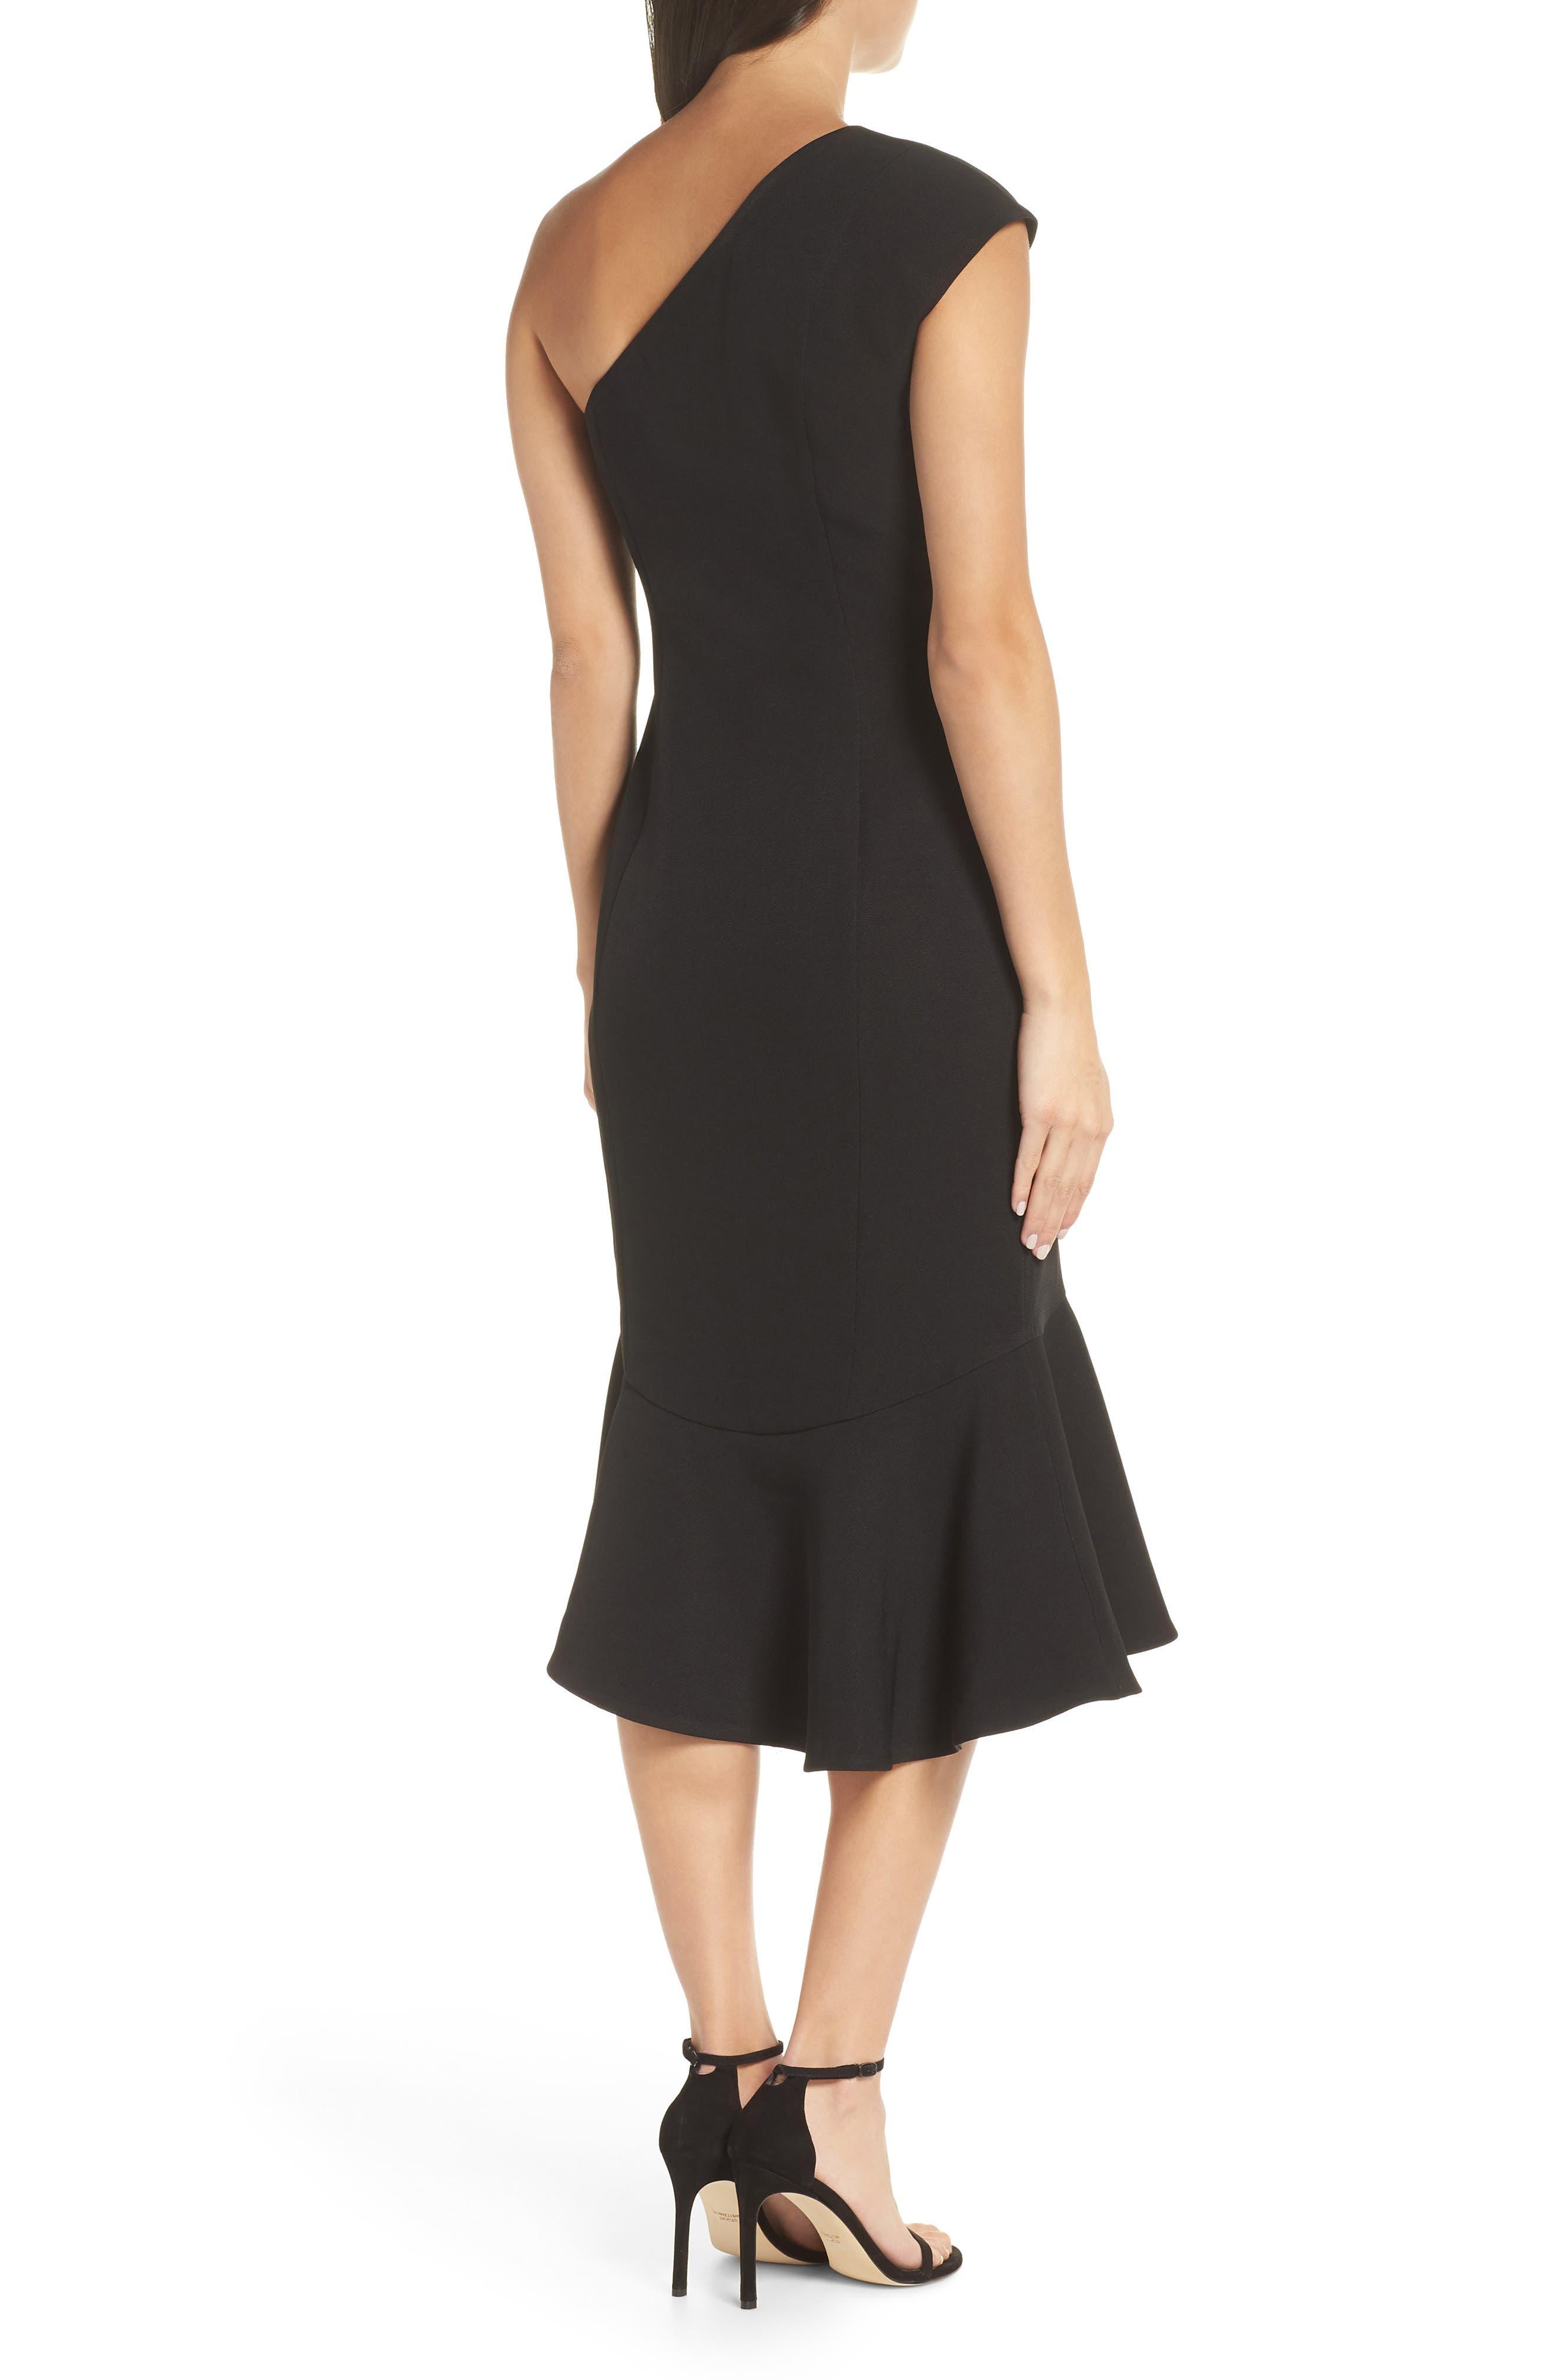 KEEPSAKE THE LABEL,                             Mirrors One-Shoulder Asymmetrical Dress,                             Alternate thumbnail 2, color,                             001